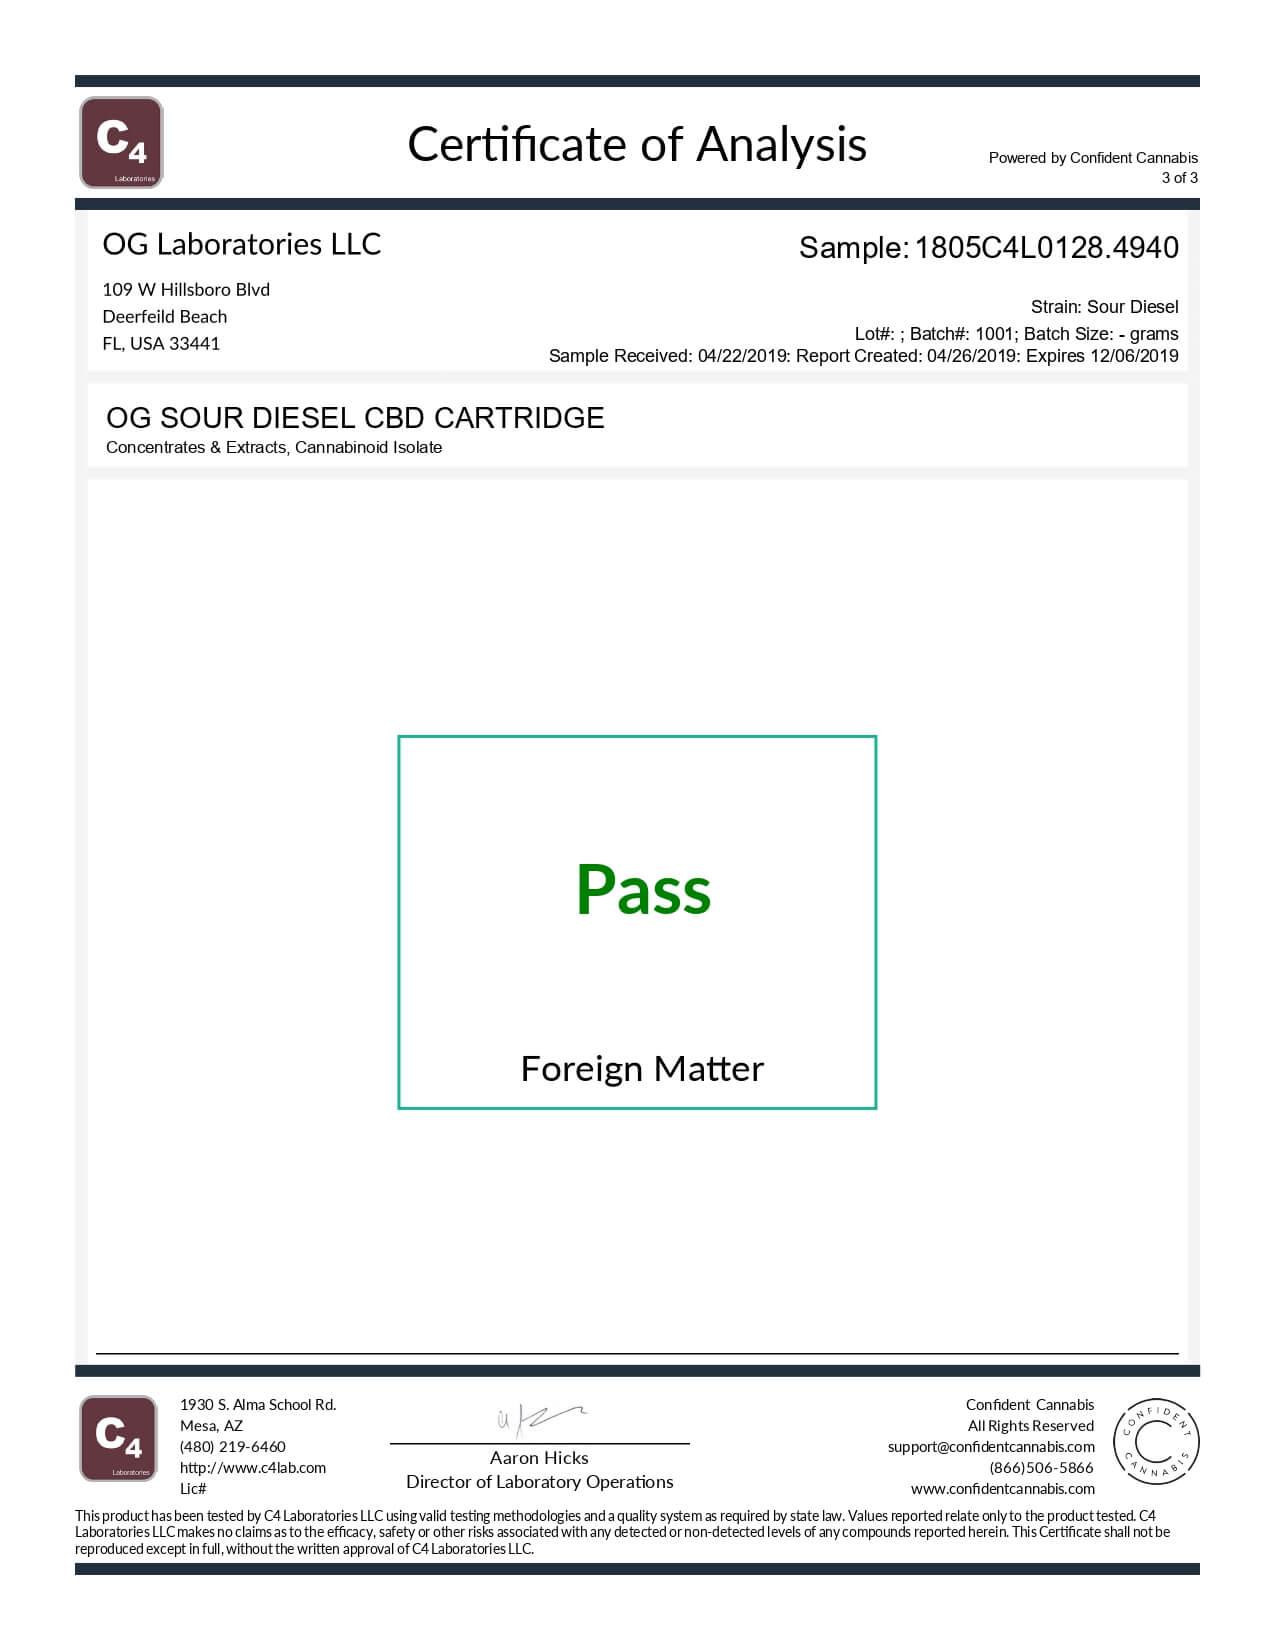 OG Labs CBD Cartridge Sour Diesel Lab Report